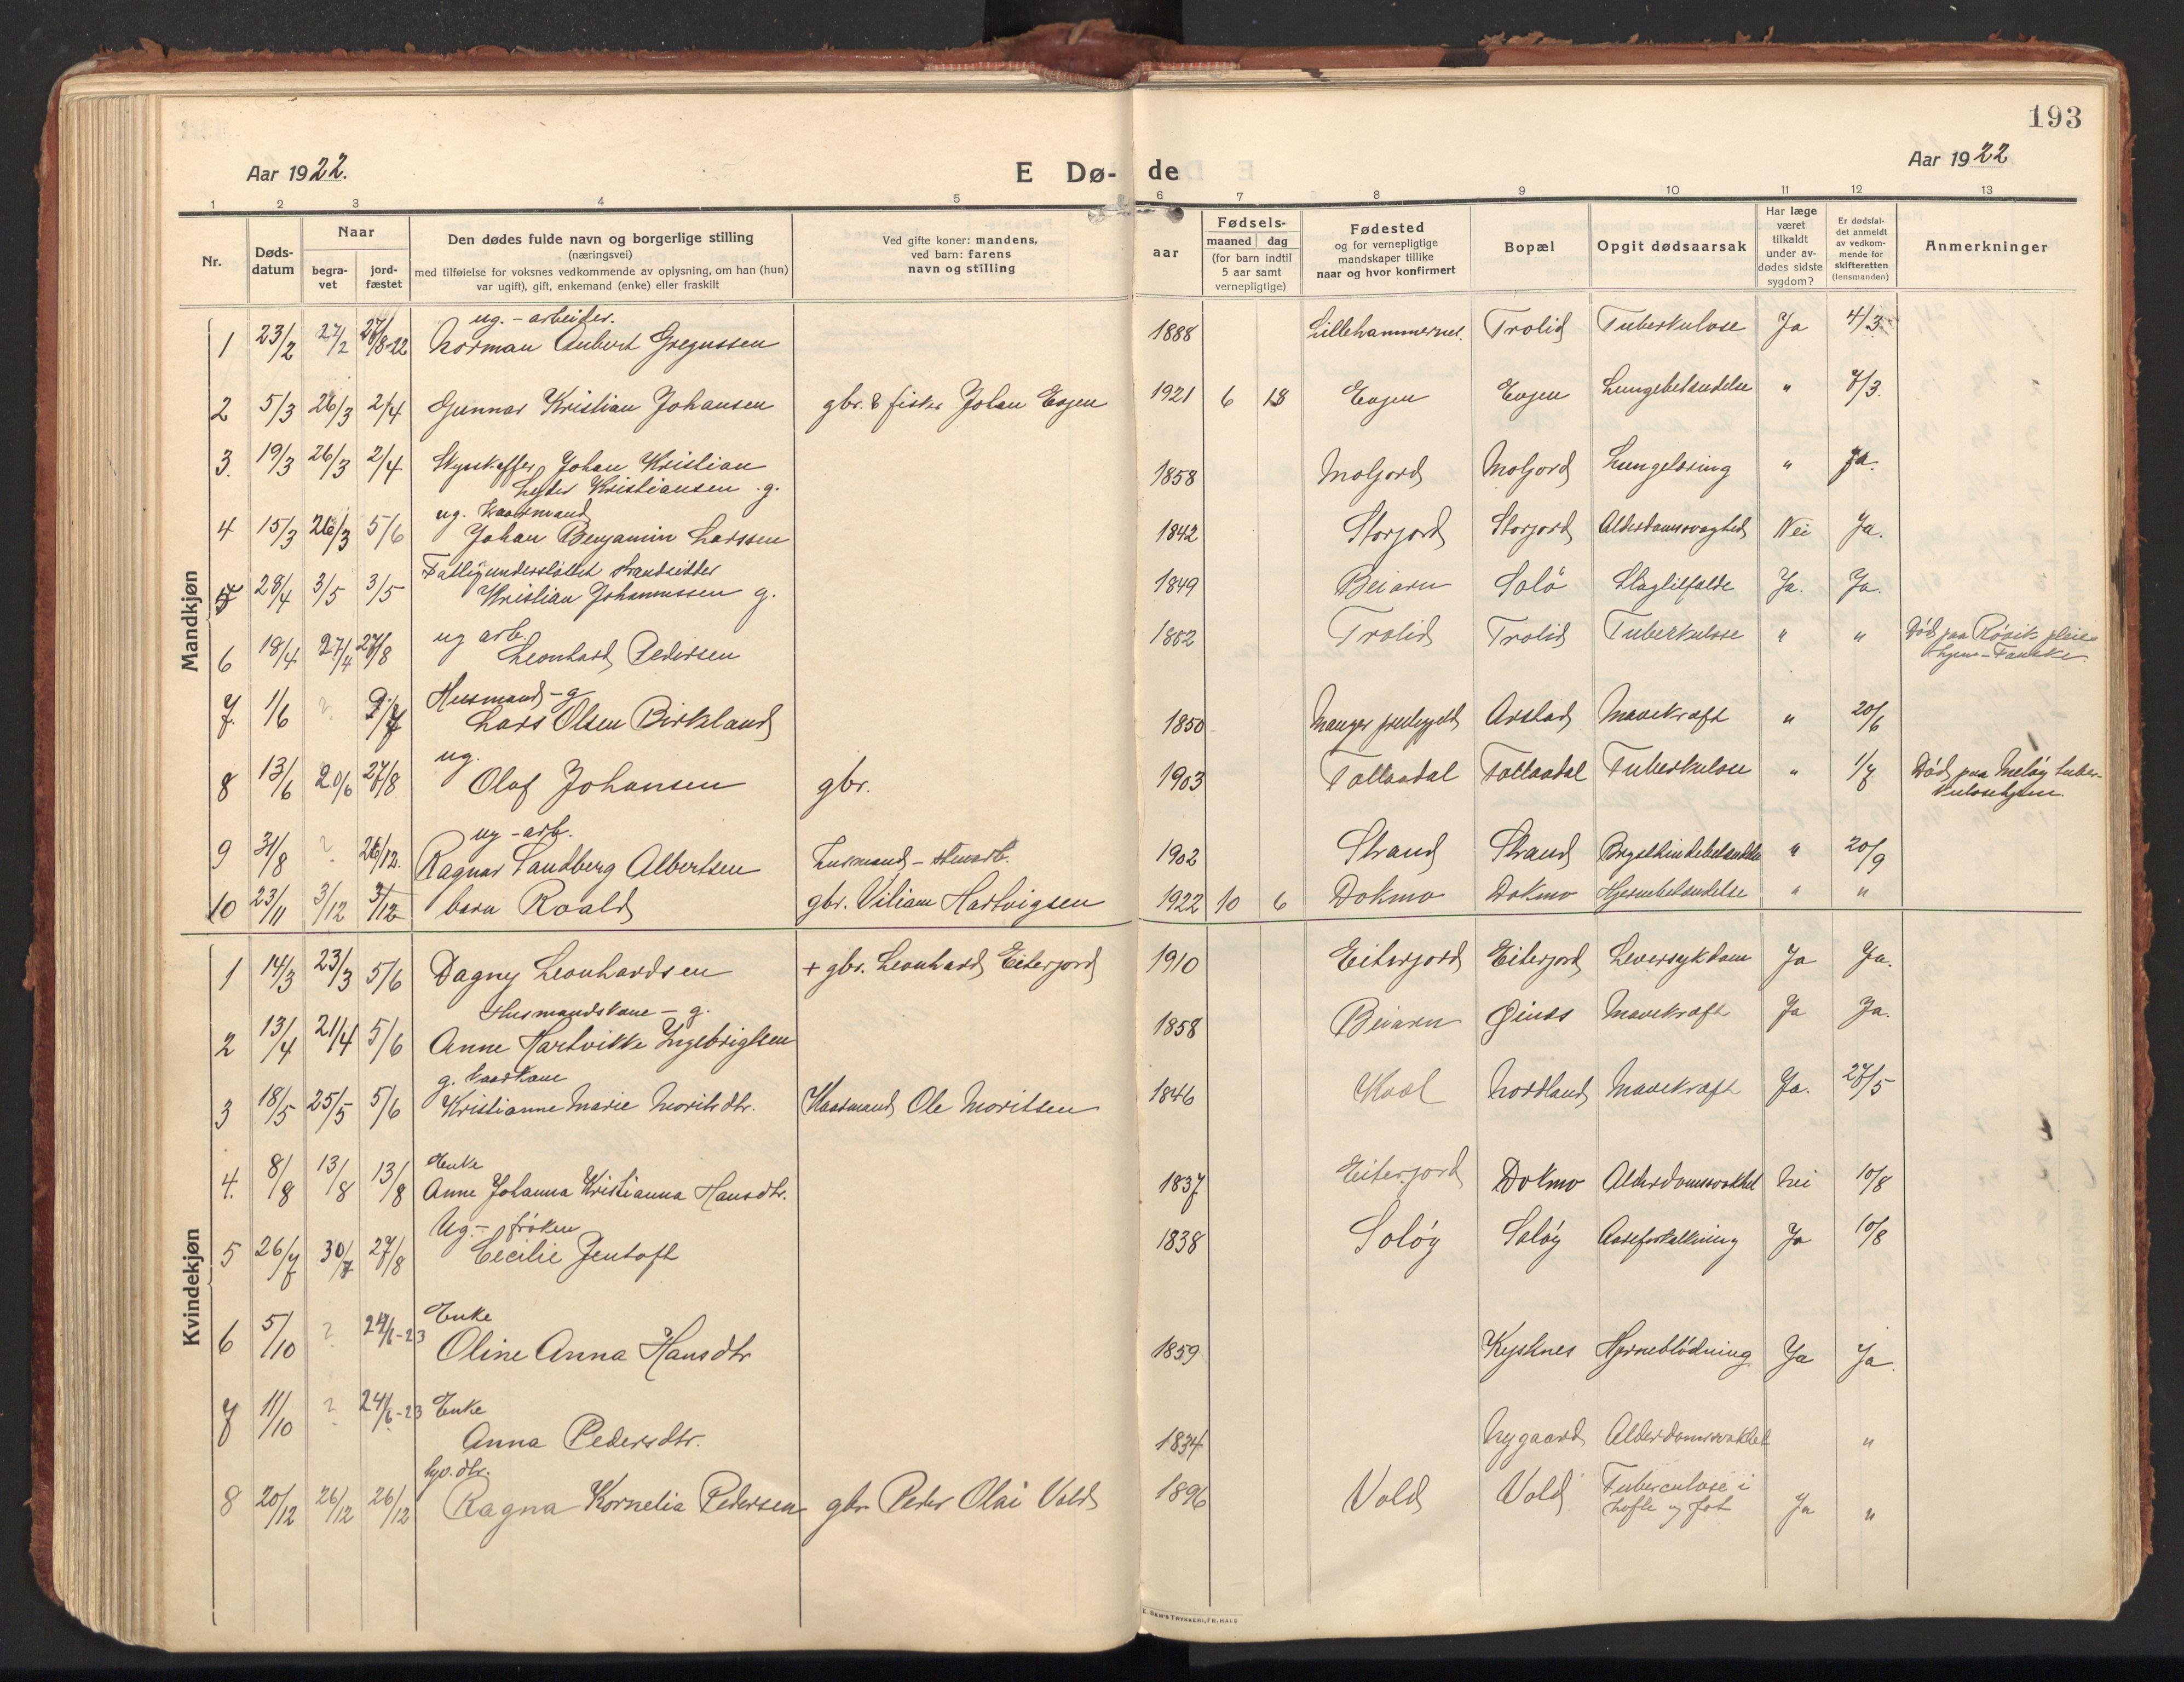 SAT, Ministerialprotokoller, klokkerbøker og fødselsregistre - Nordland, 846/L0650: Ministerialbok nr. 846A08, 1916-1935, s. 193